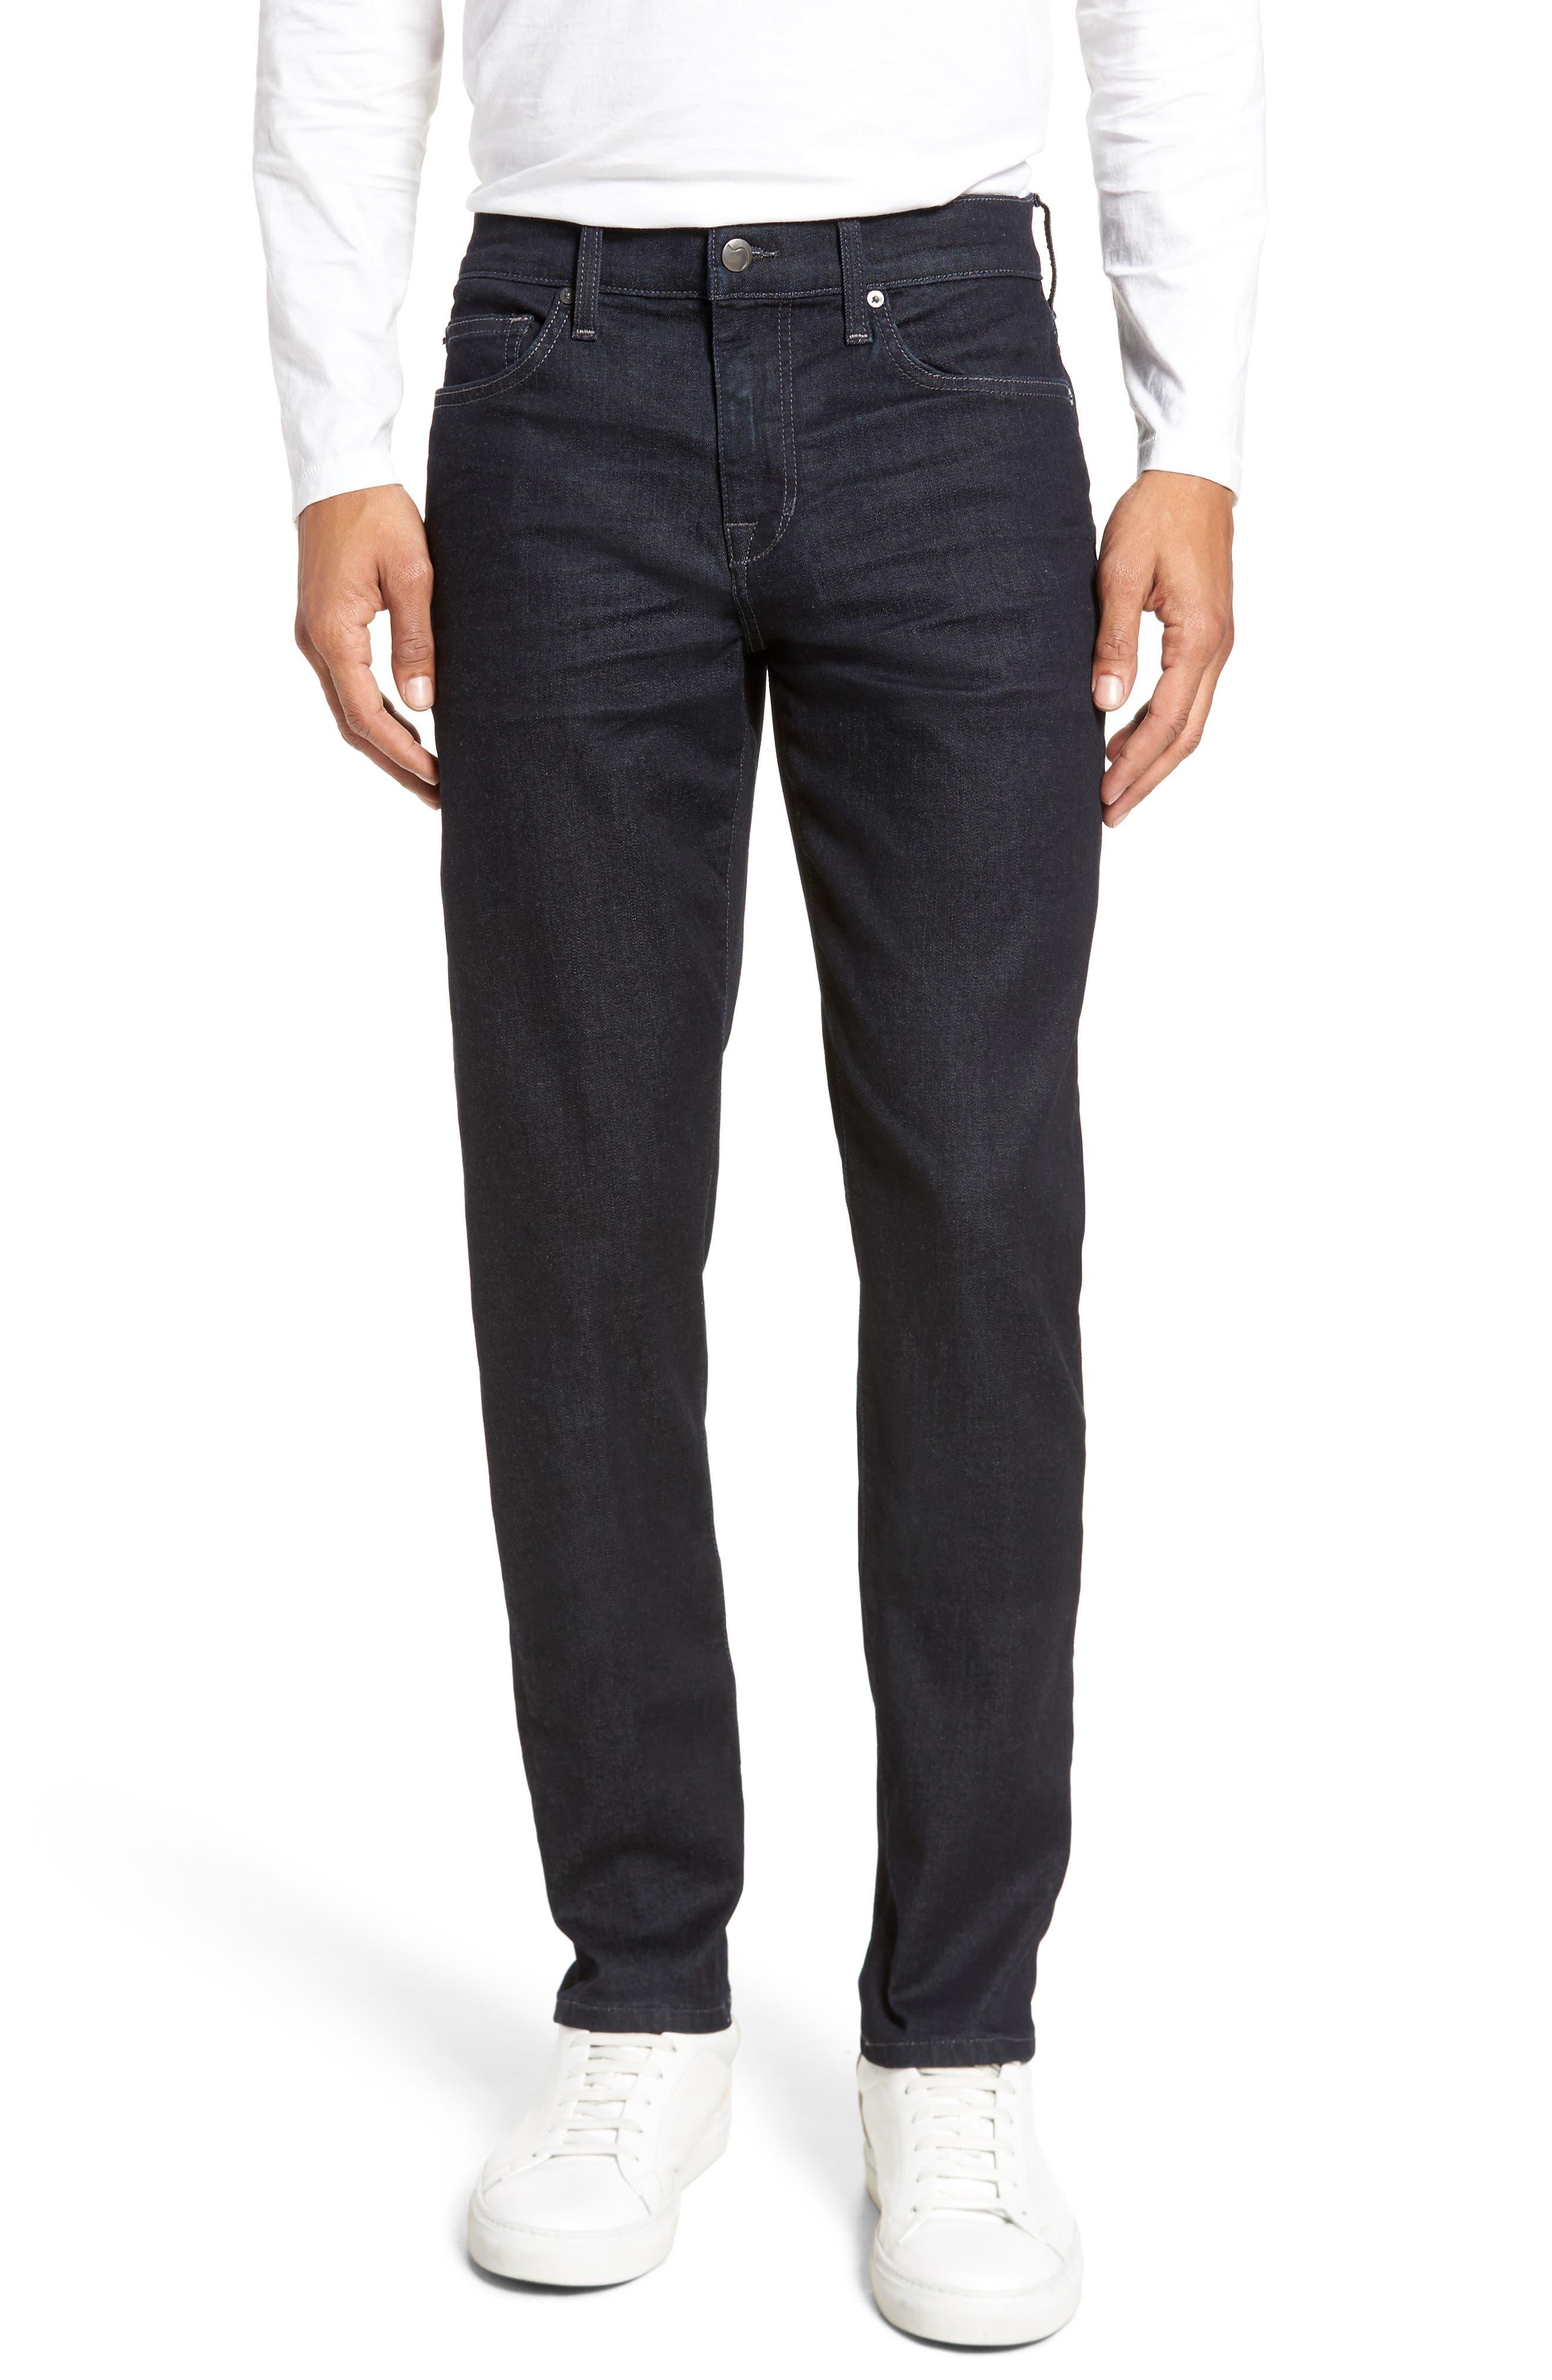 Main Image - Joe's Slim Slim Fit Jeans (Nuhollis)